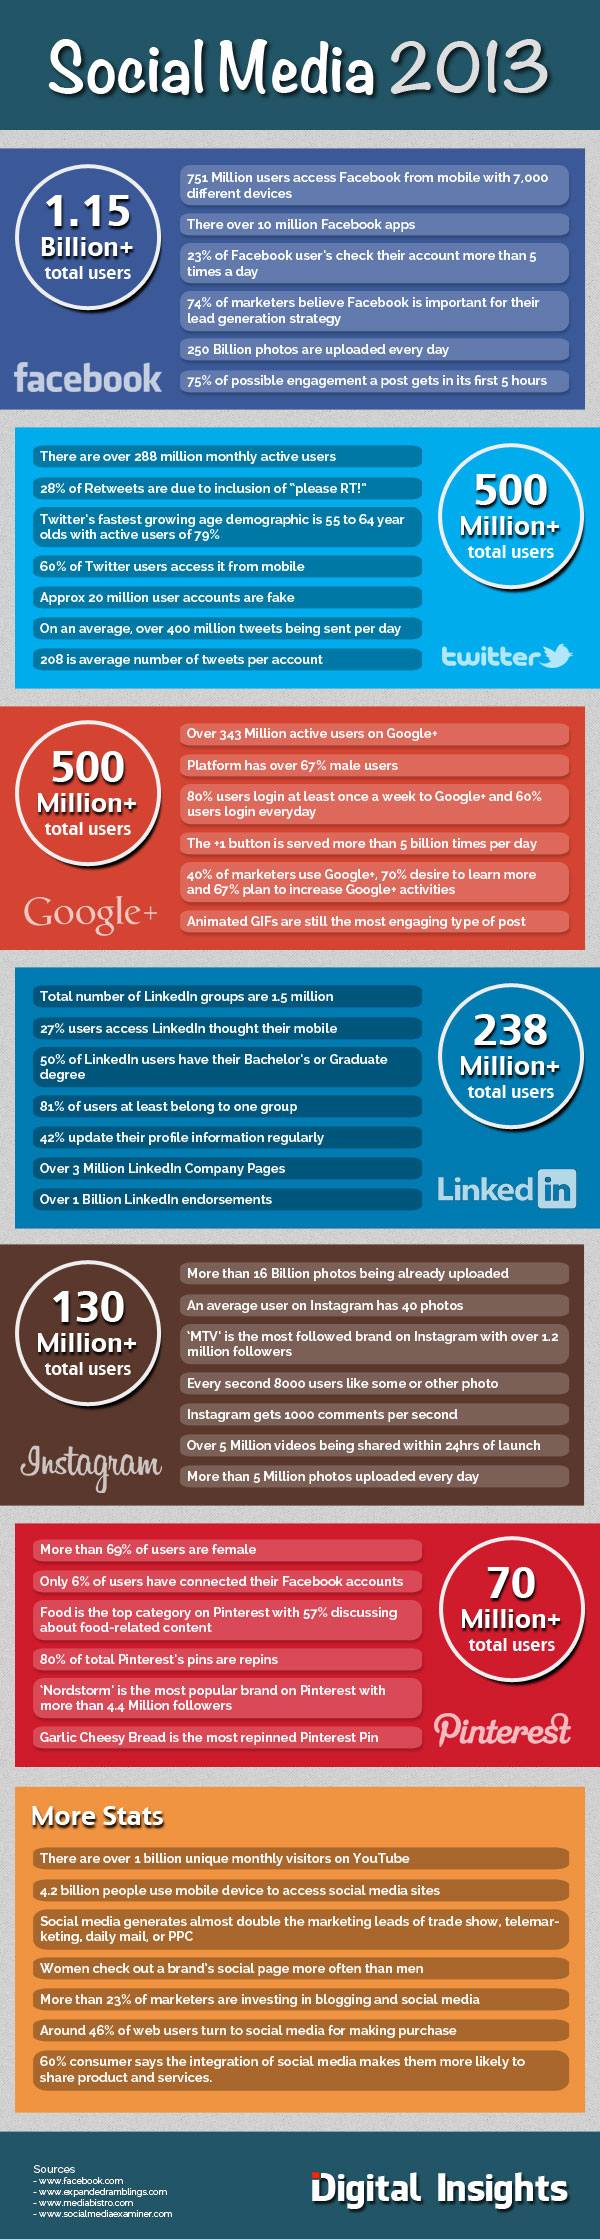 social-media-facts-2013_525a69cdede3b